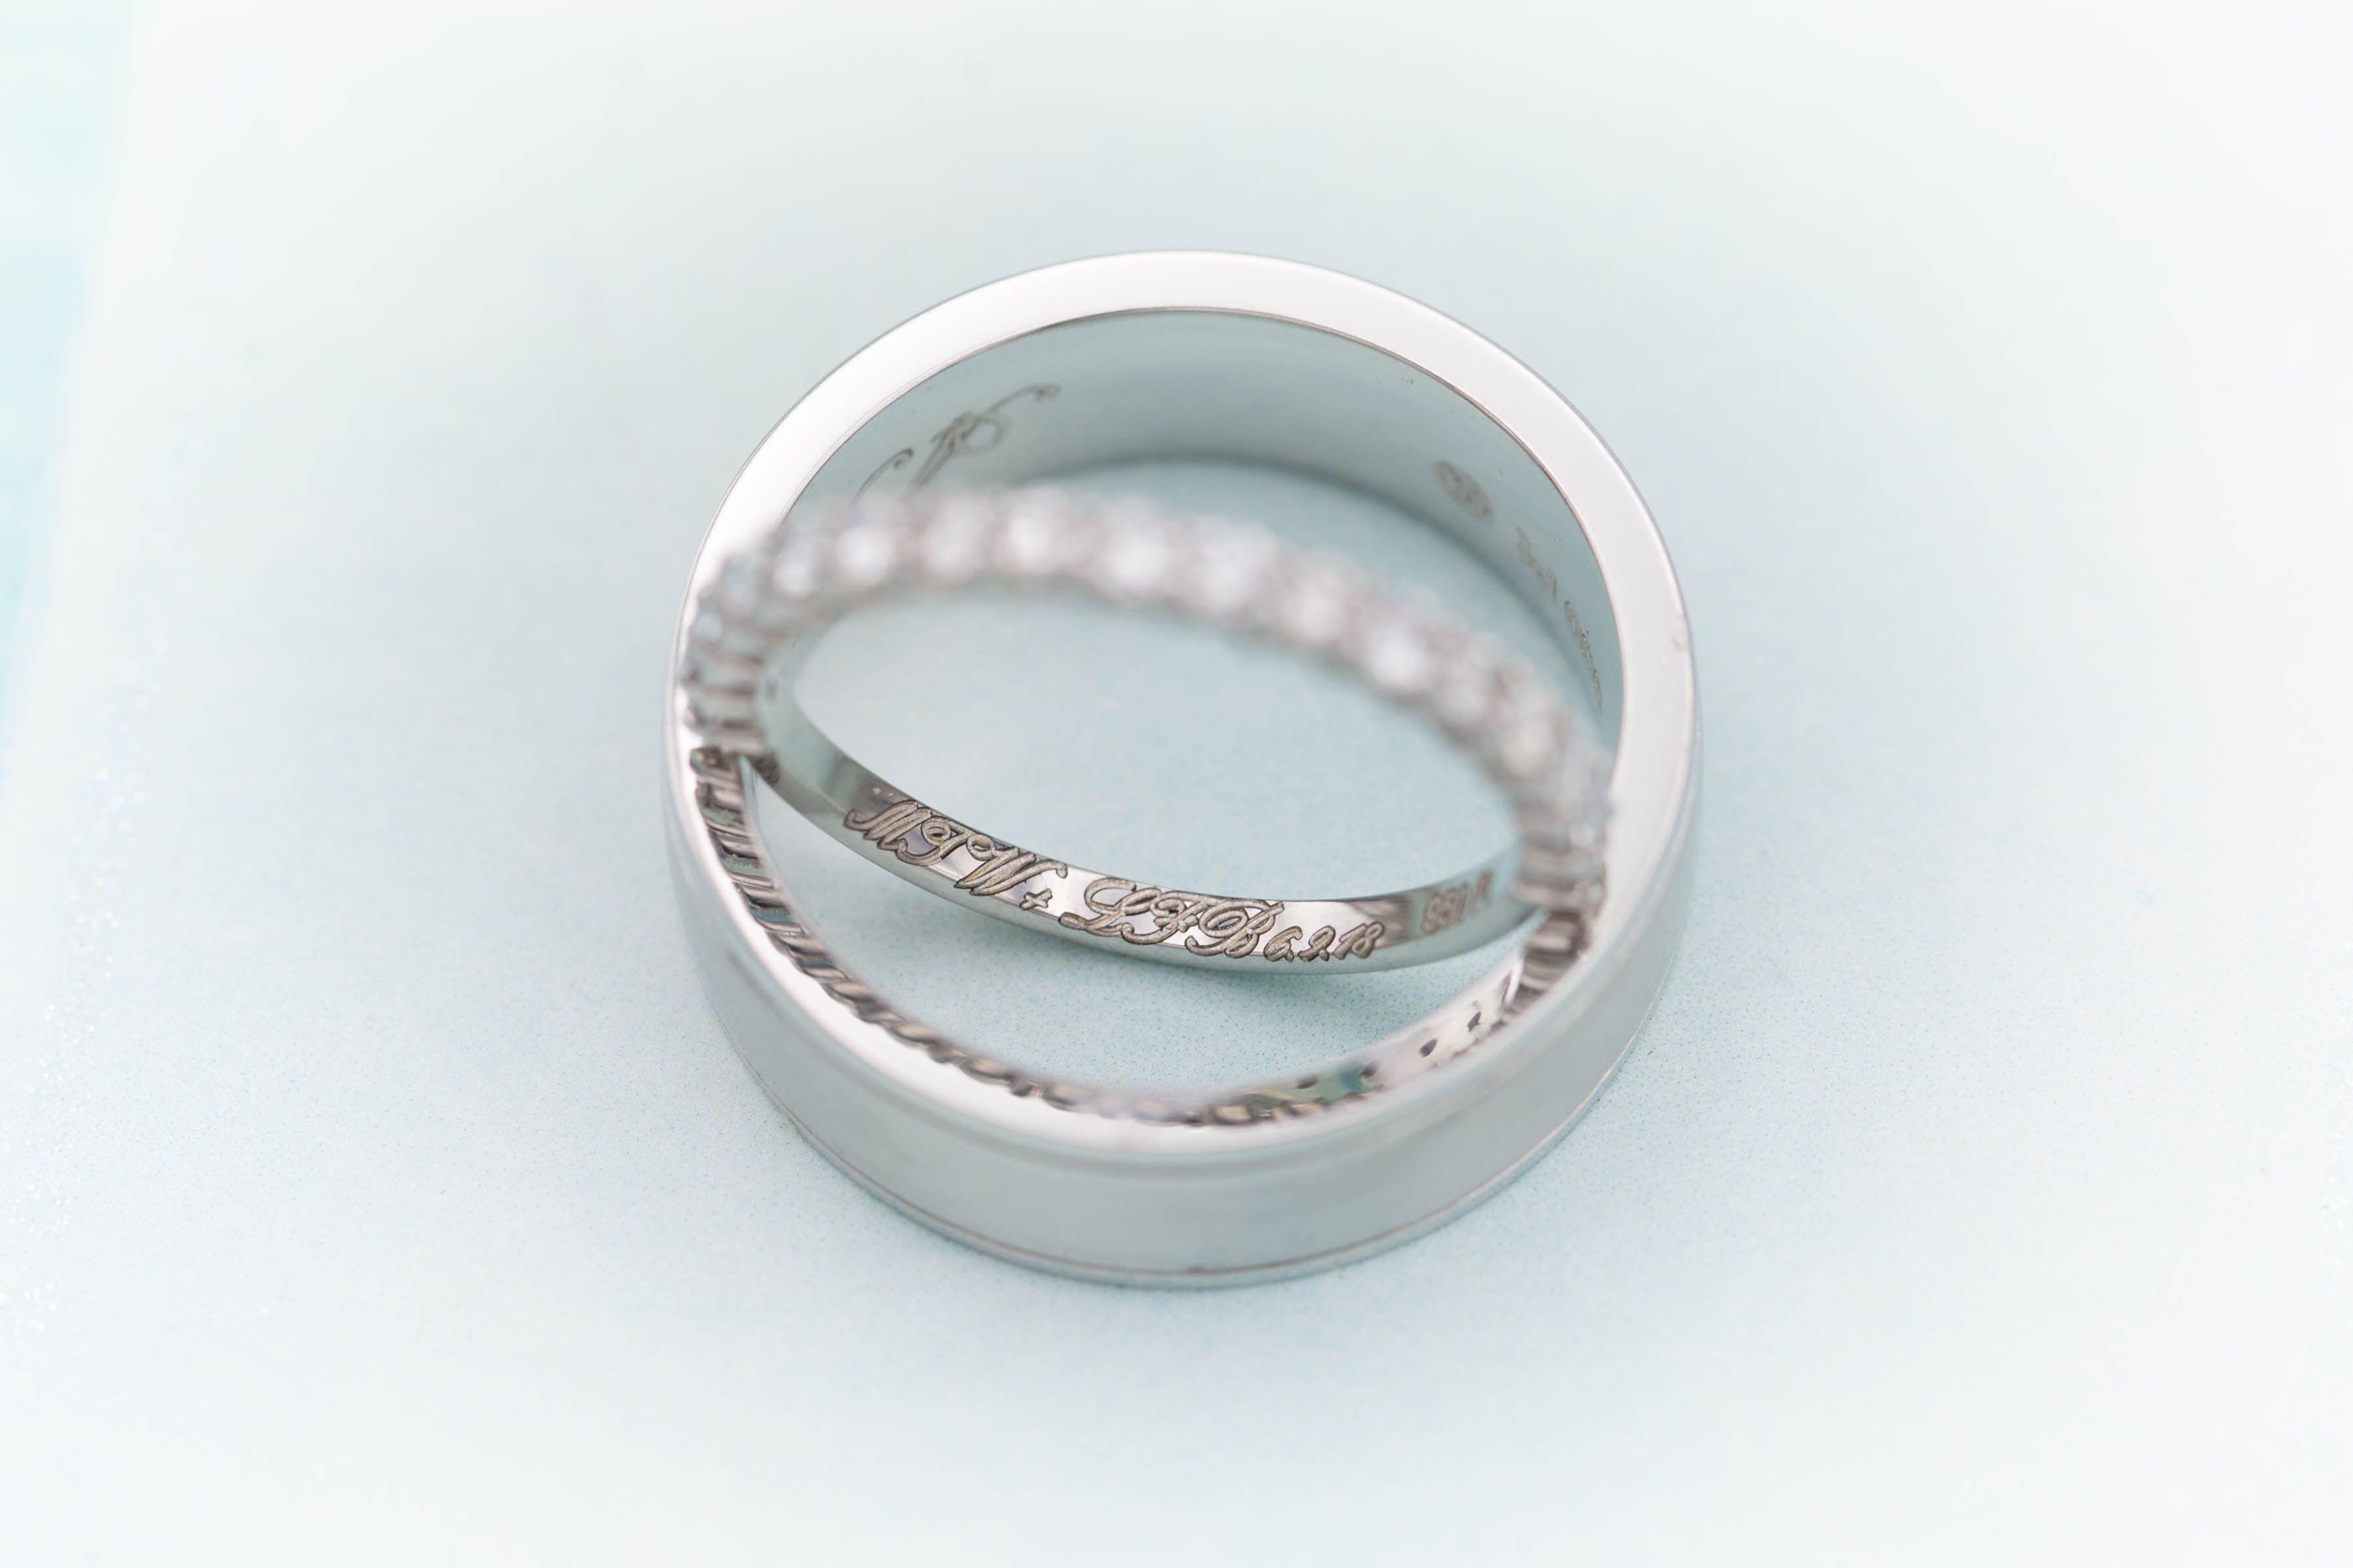 Vintage wedding rings new york - Vintage Wedding Rings New York 49